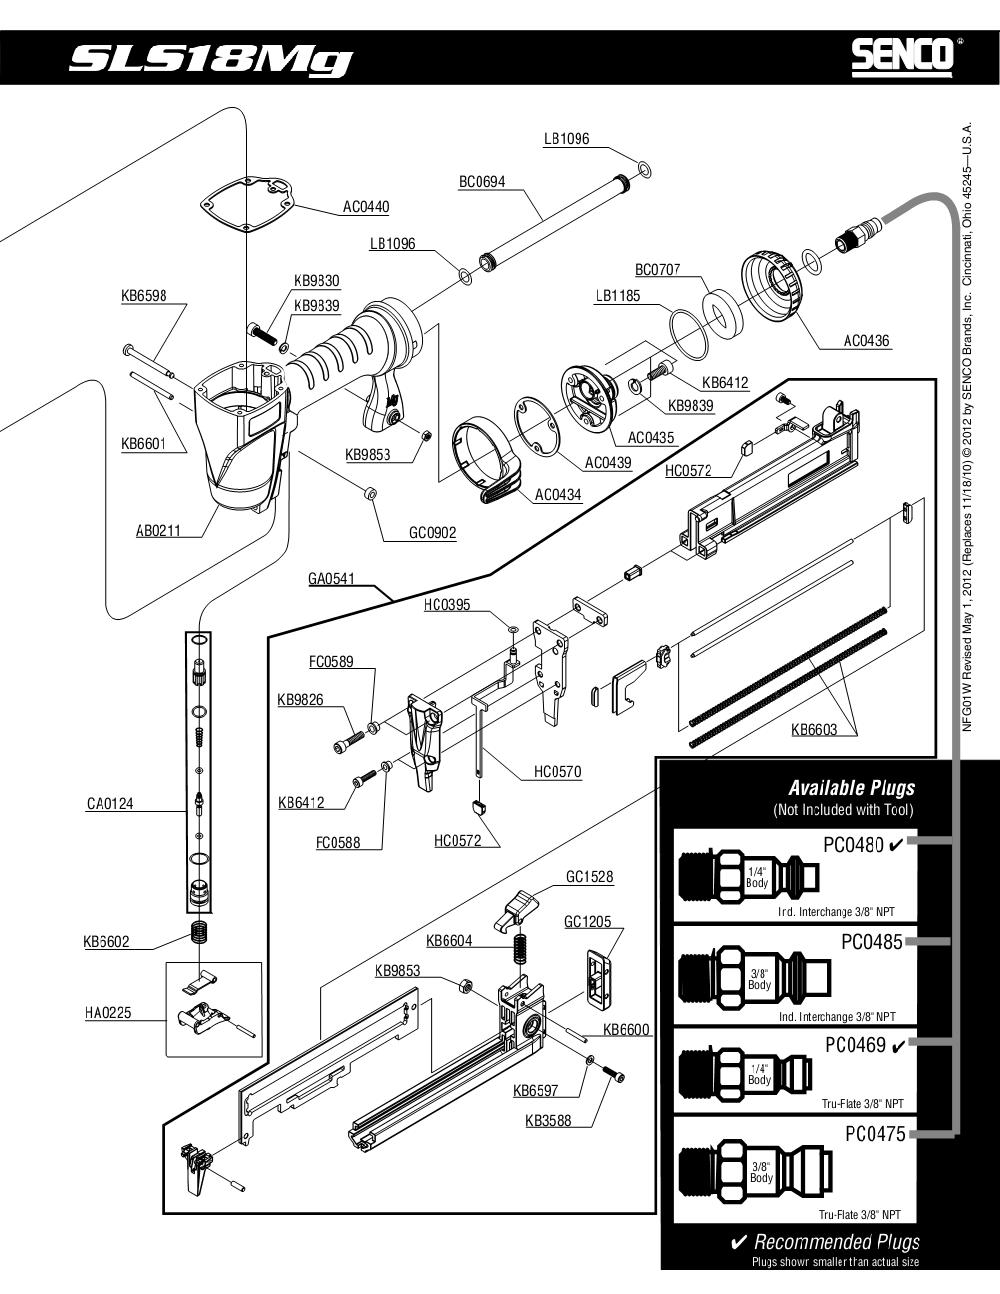 1W0021N-senco-PB-1Break Down